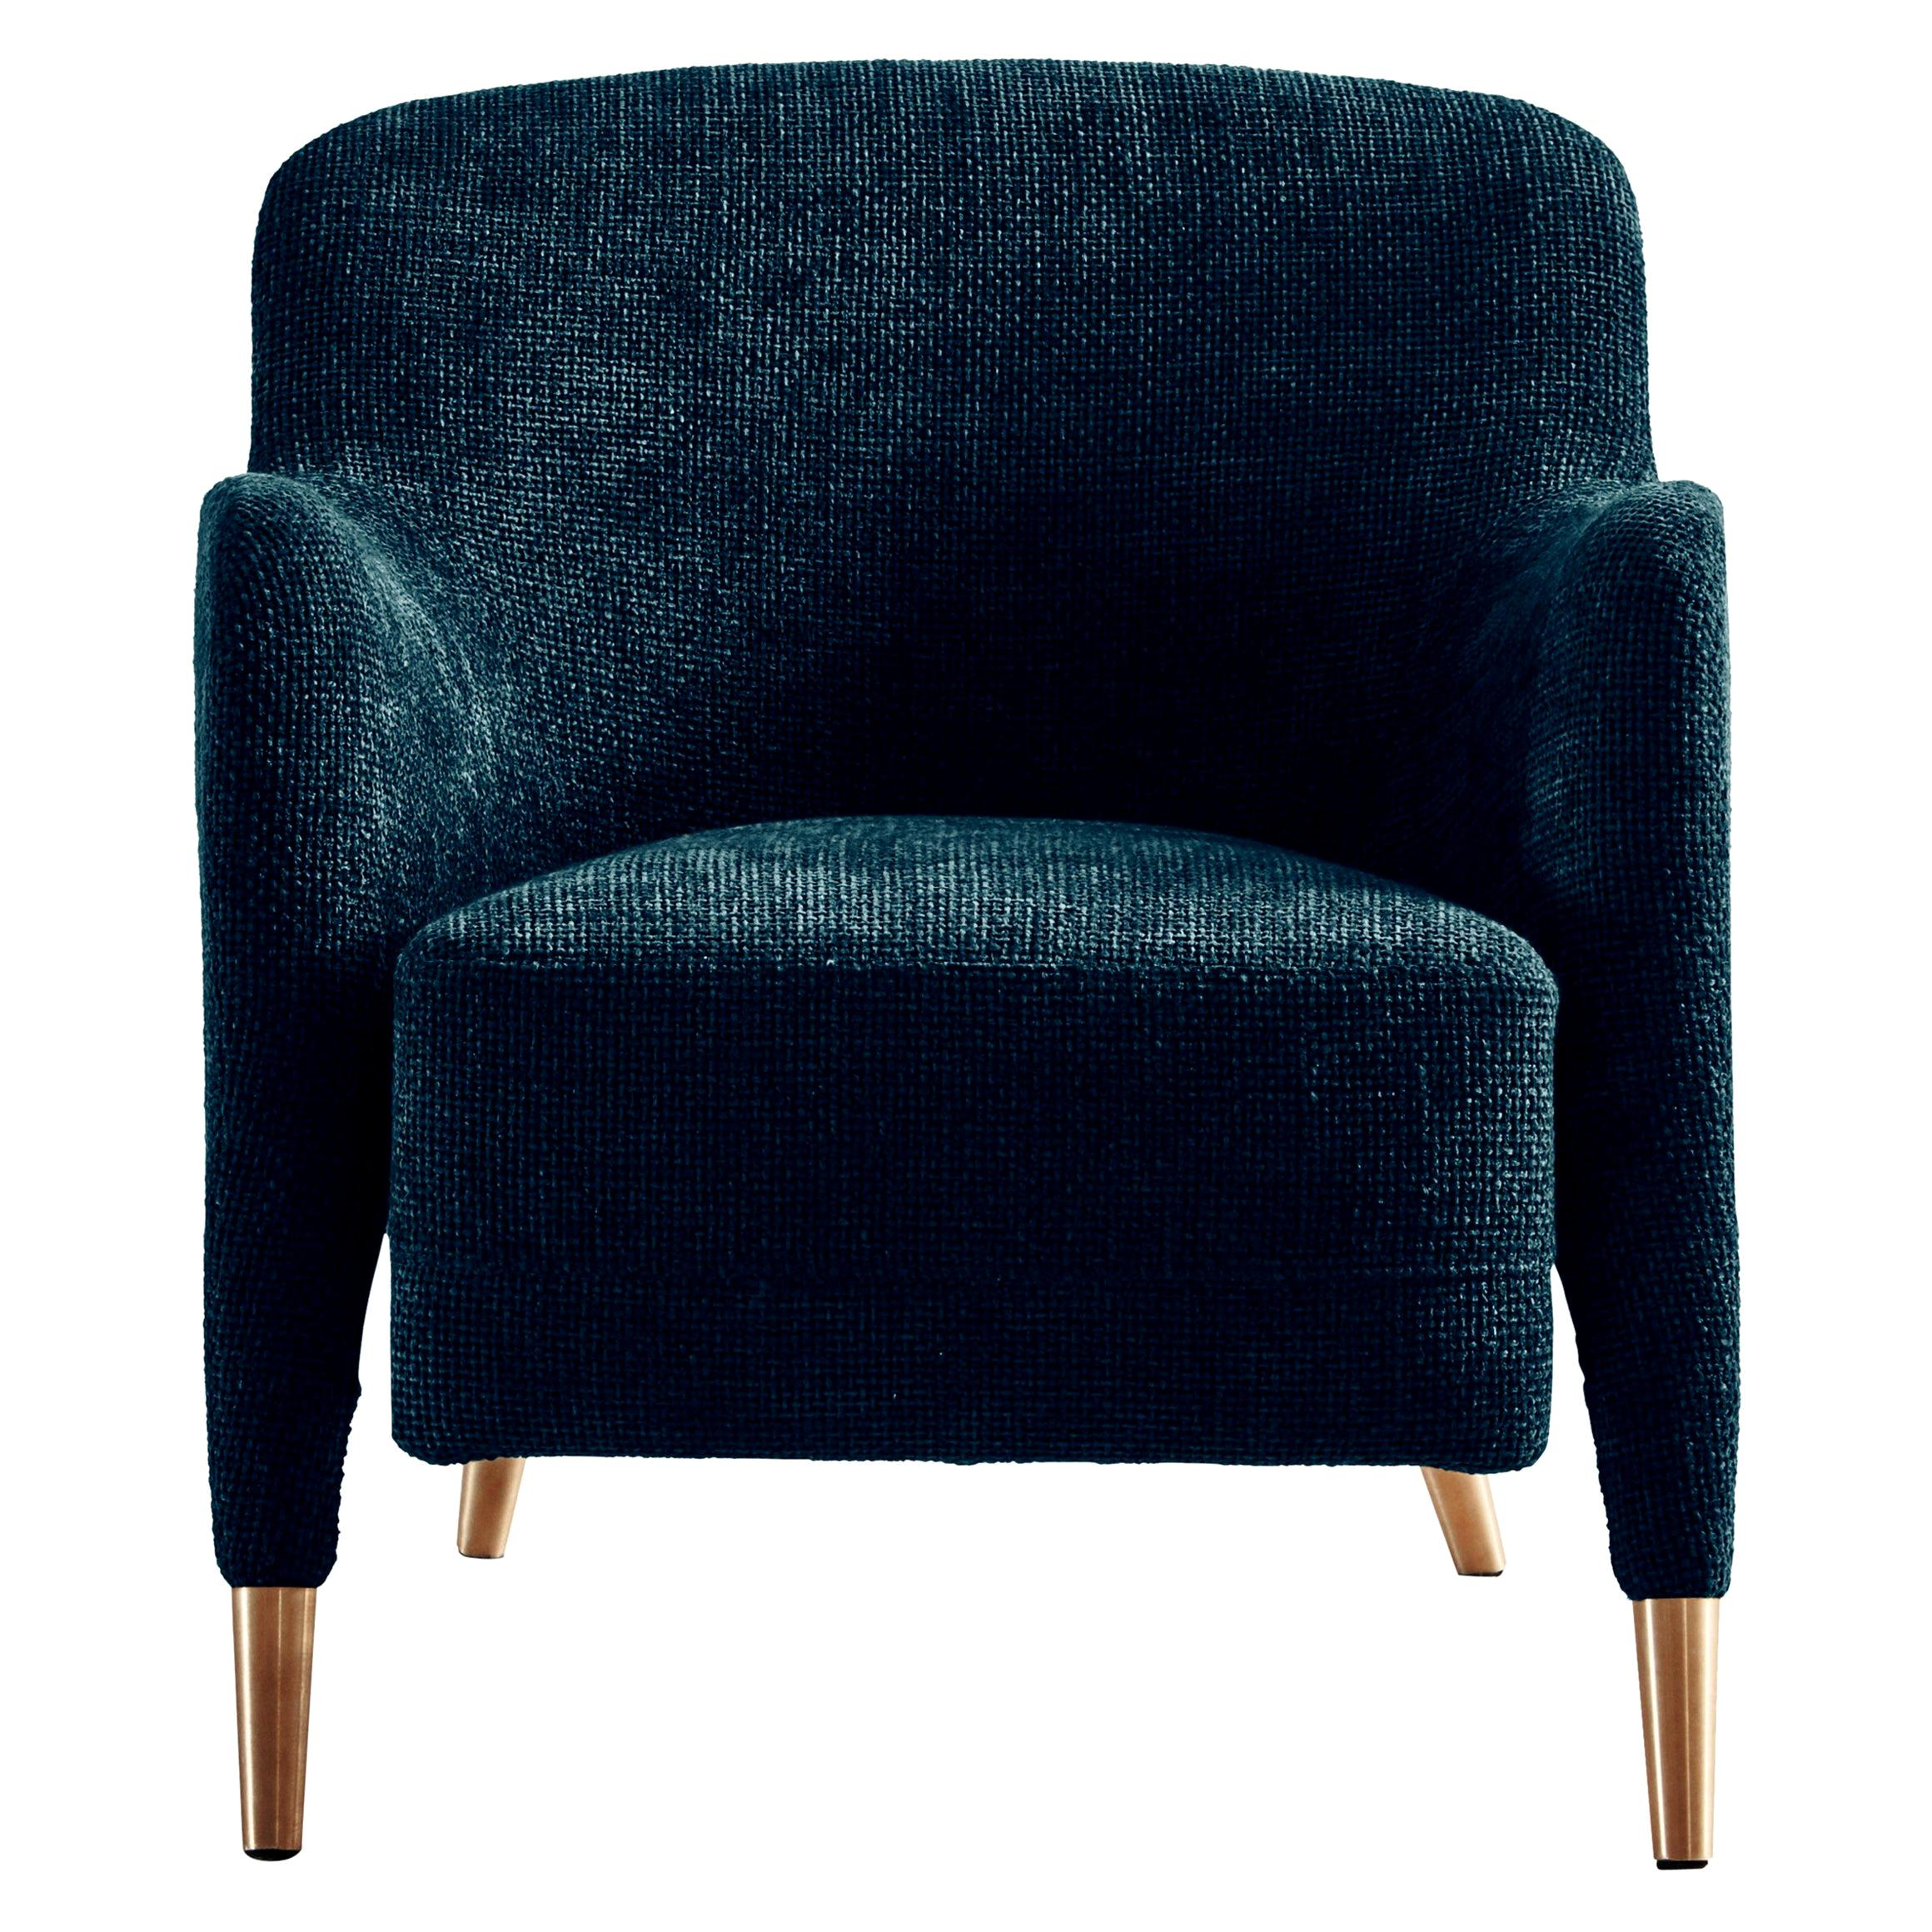 Molteni&C D.151.4 Armchair in Blue Velvet by Gio Ponti